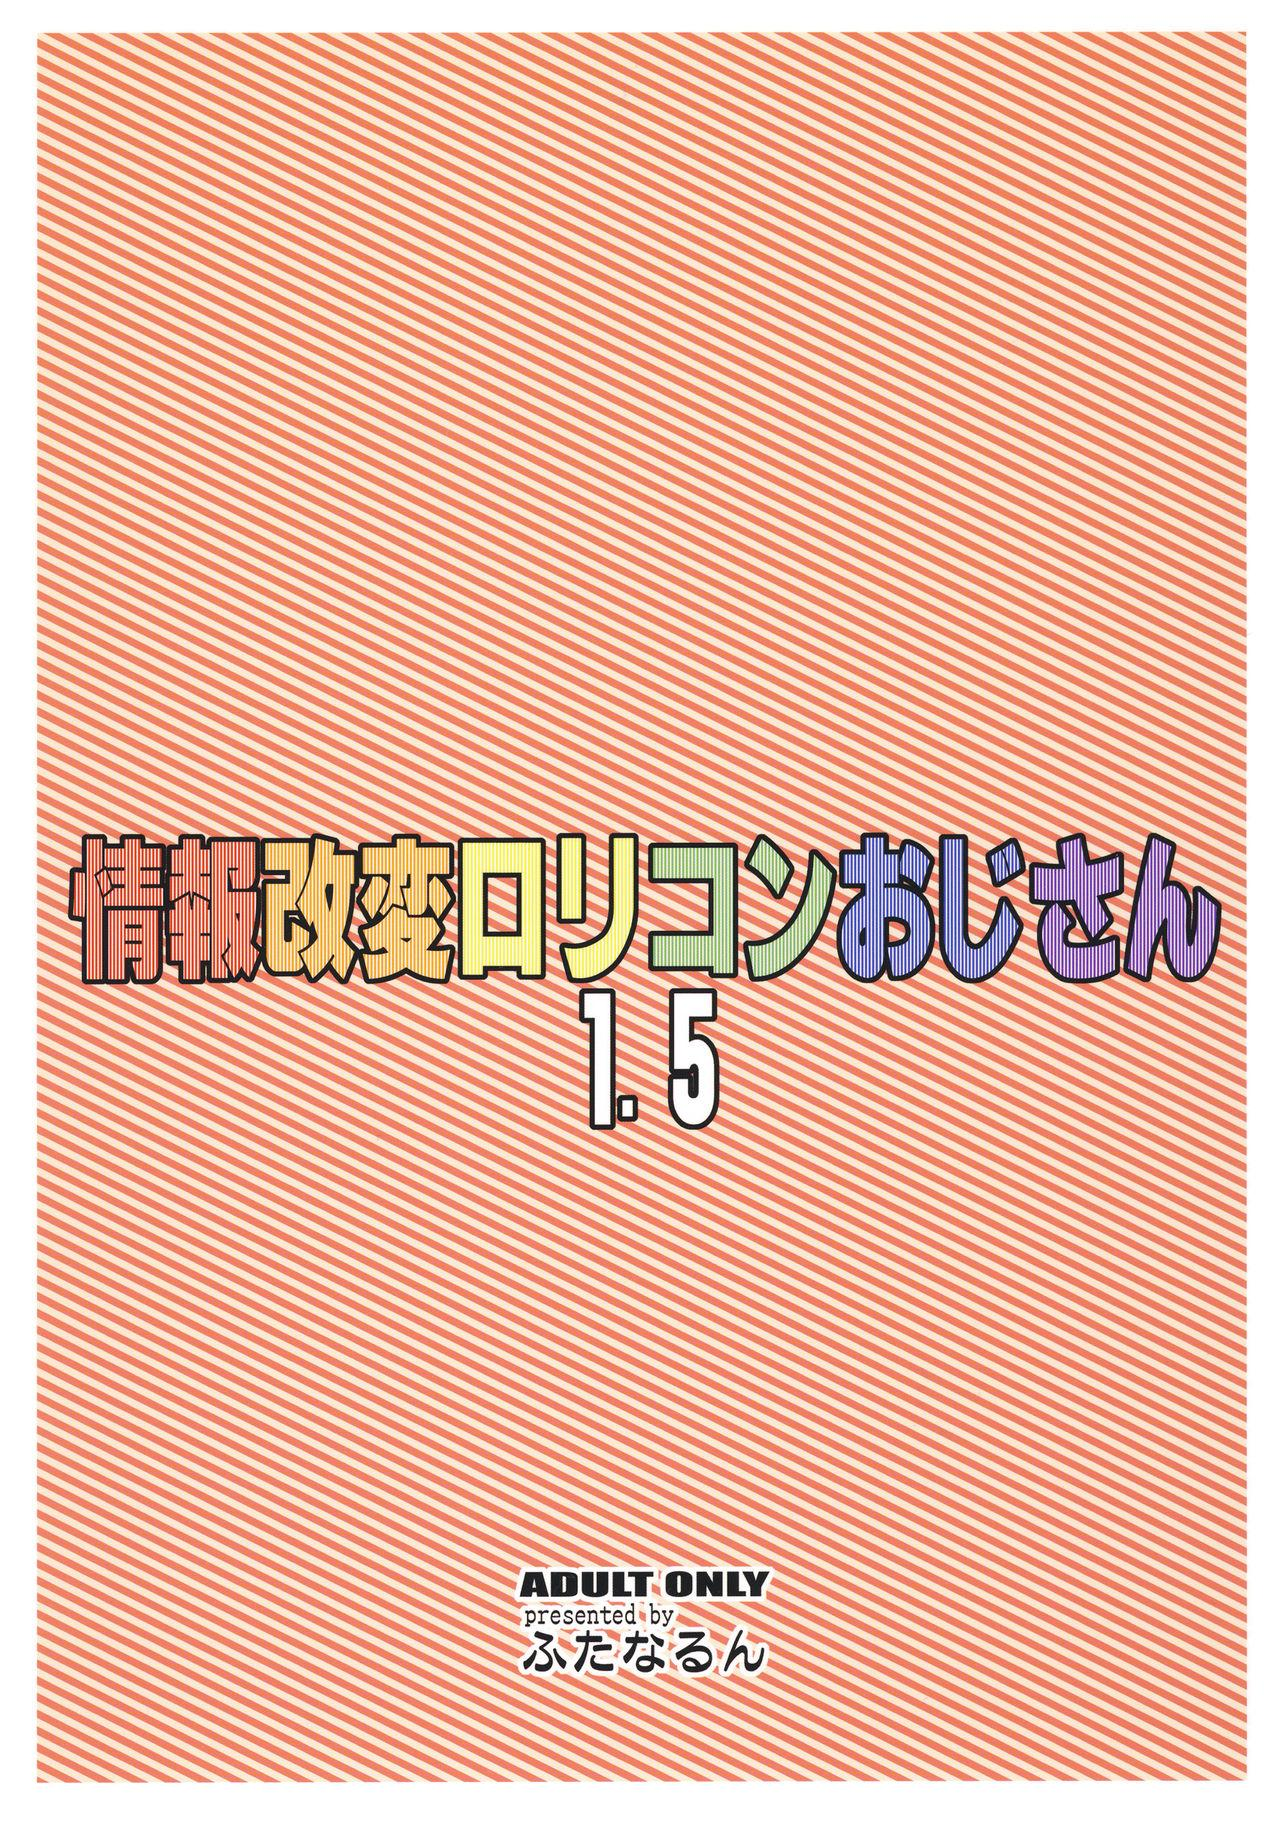 Jouhou Kaihen Lolicon Oji-san 1.5 21